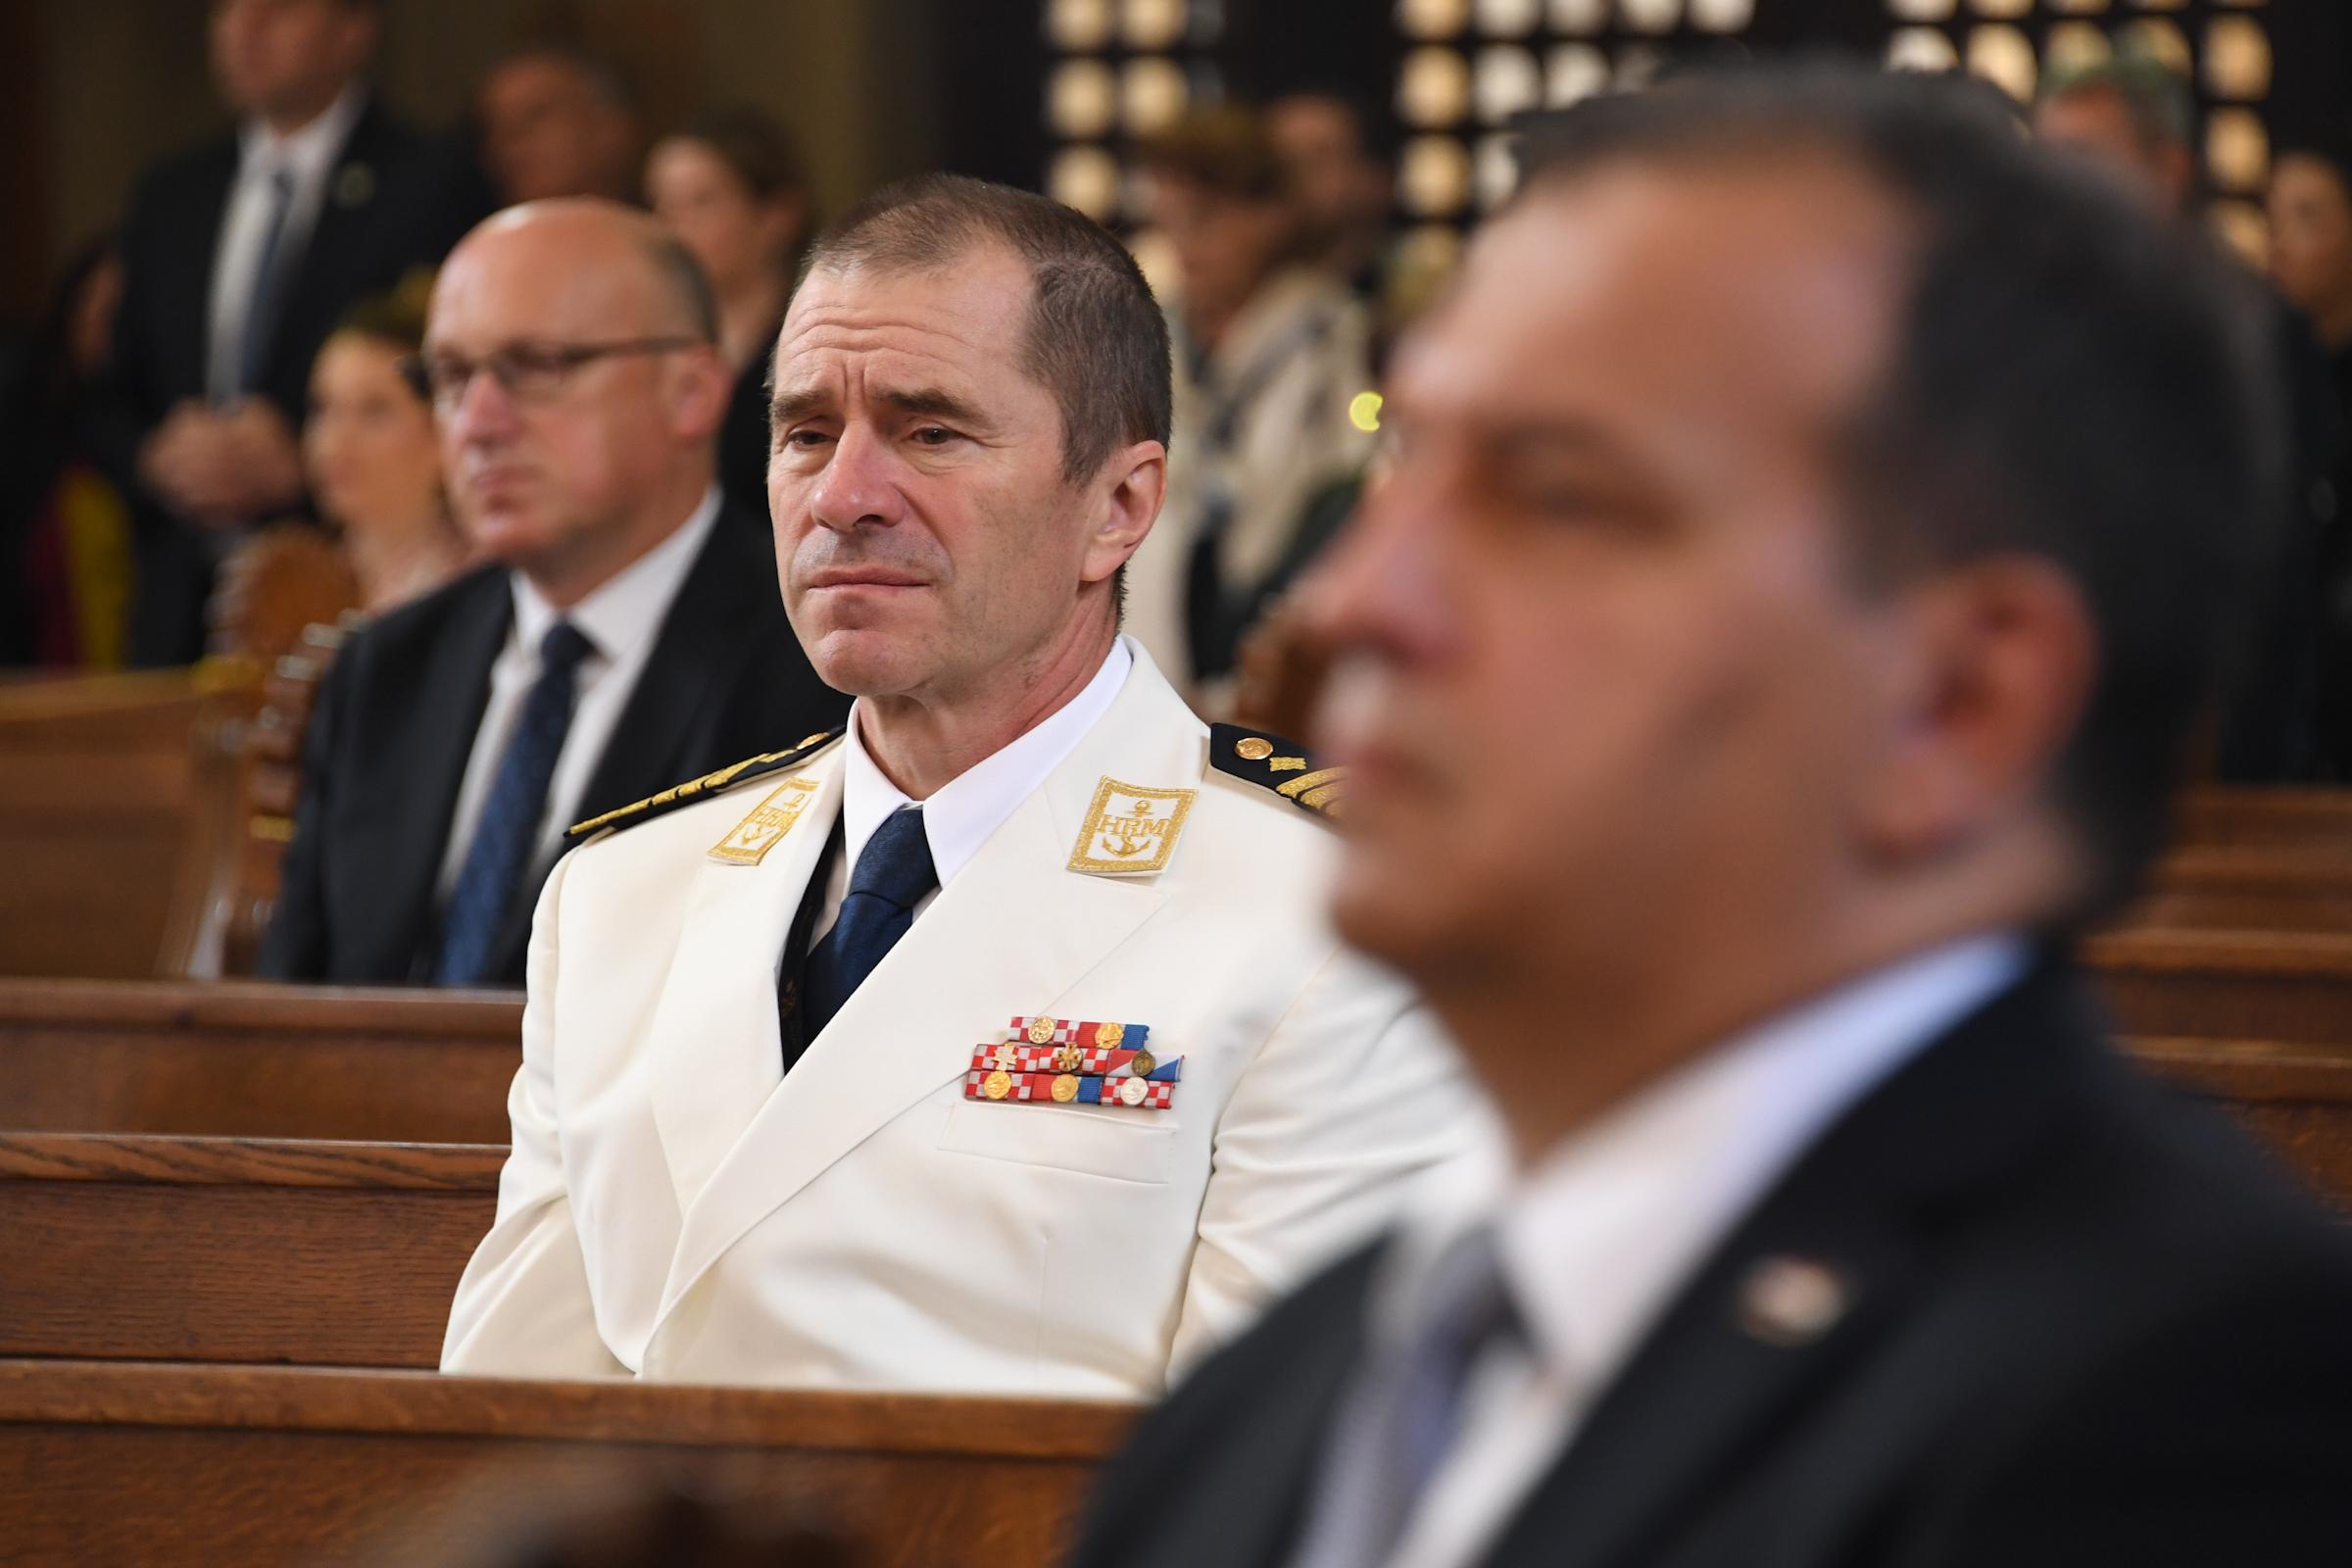 Započelo obilježavanje Dana državnosti Republike Hrvatske